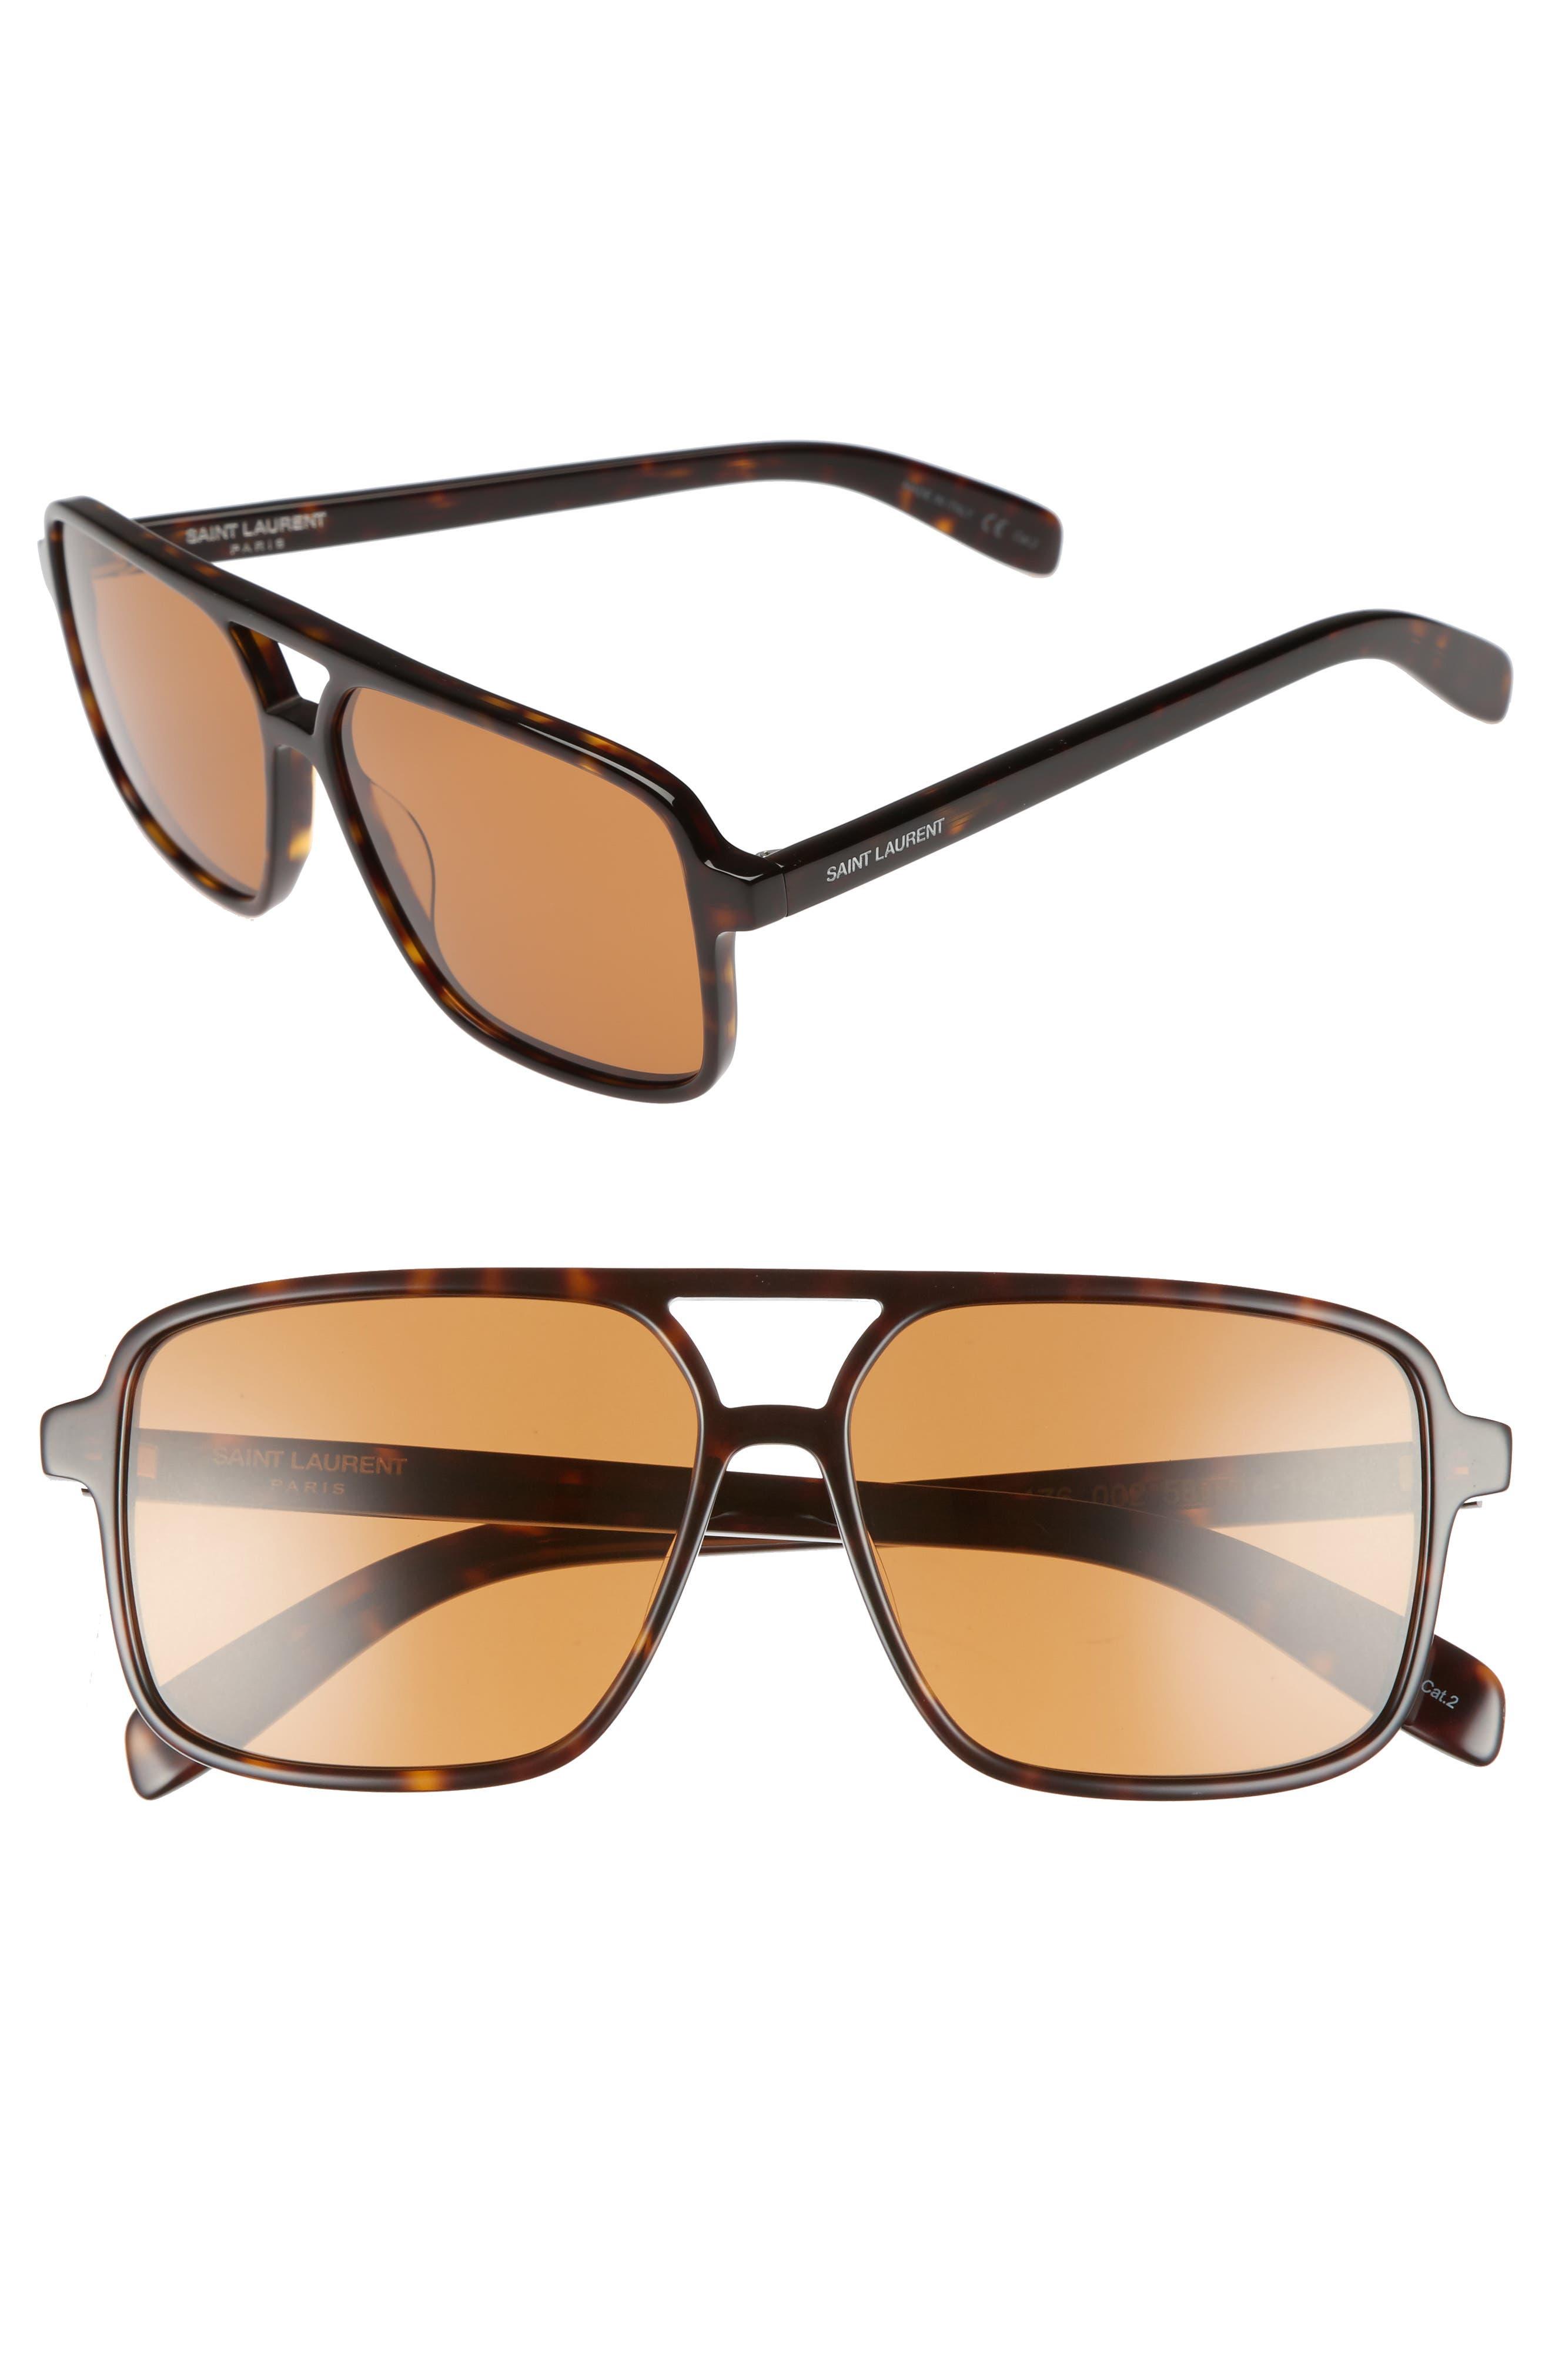 Main Image - Saint Laurent 58mm Square Navigator Sunglasses